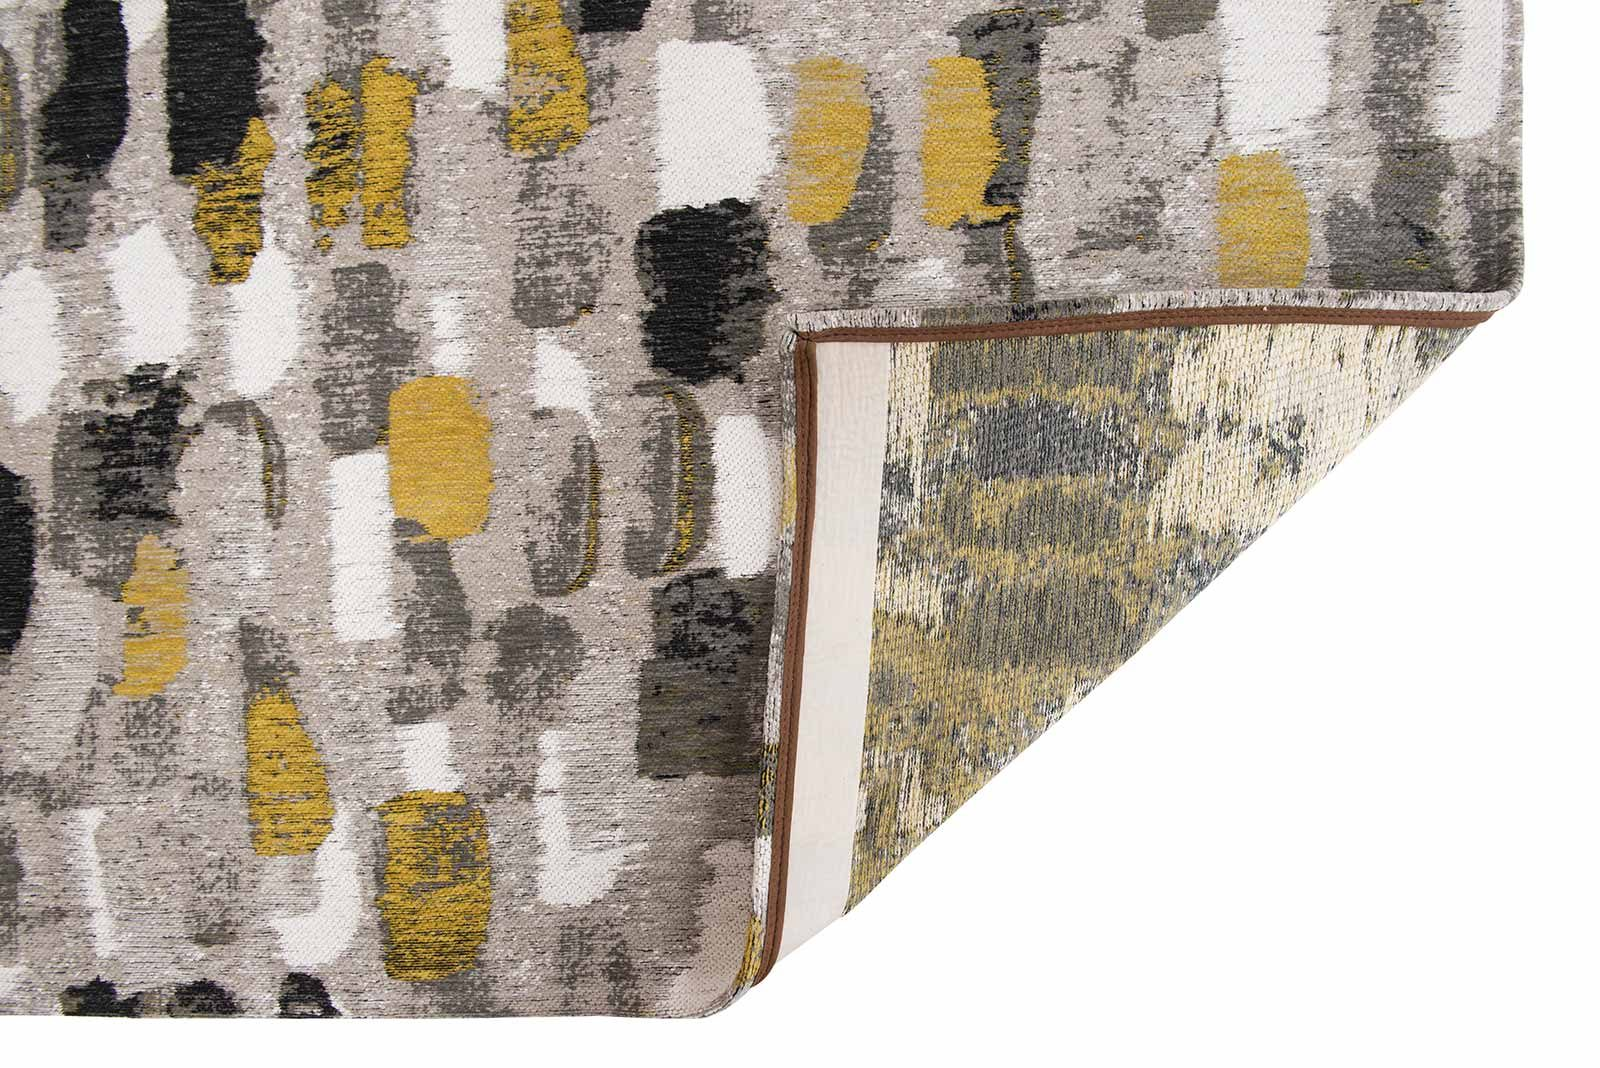 Louis De Poortere rugs Romo LX 8740 Murano Sunflower back